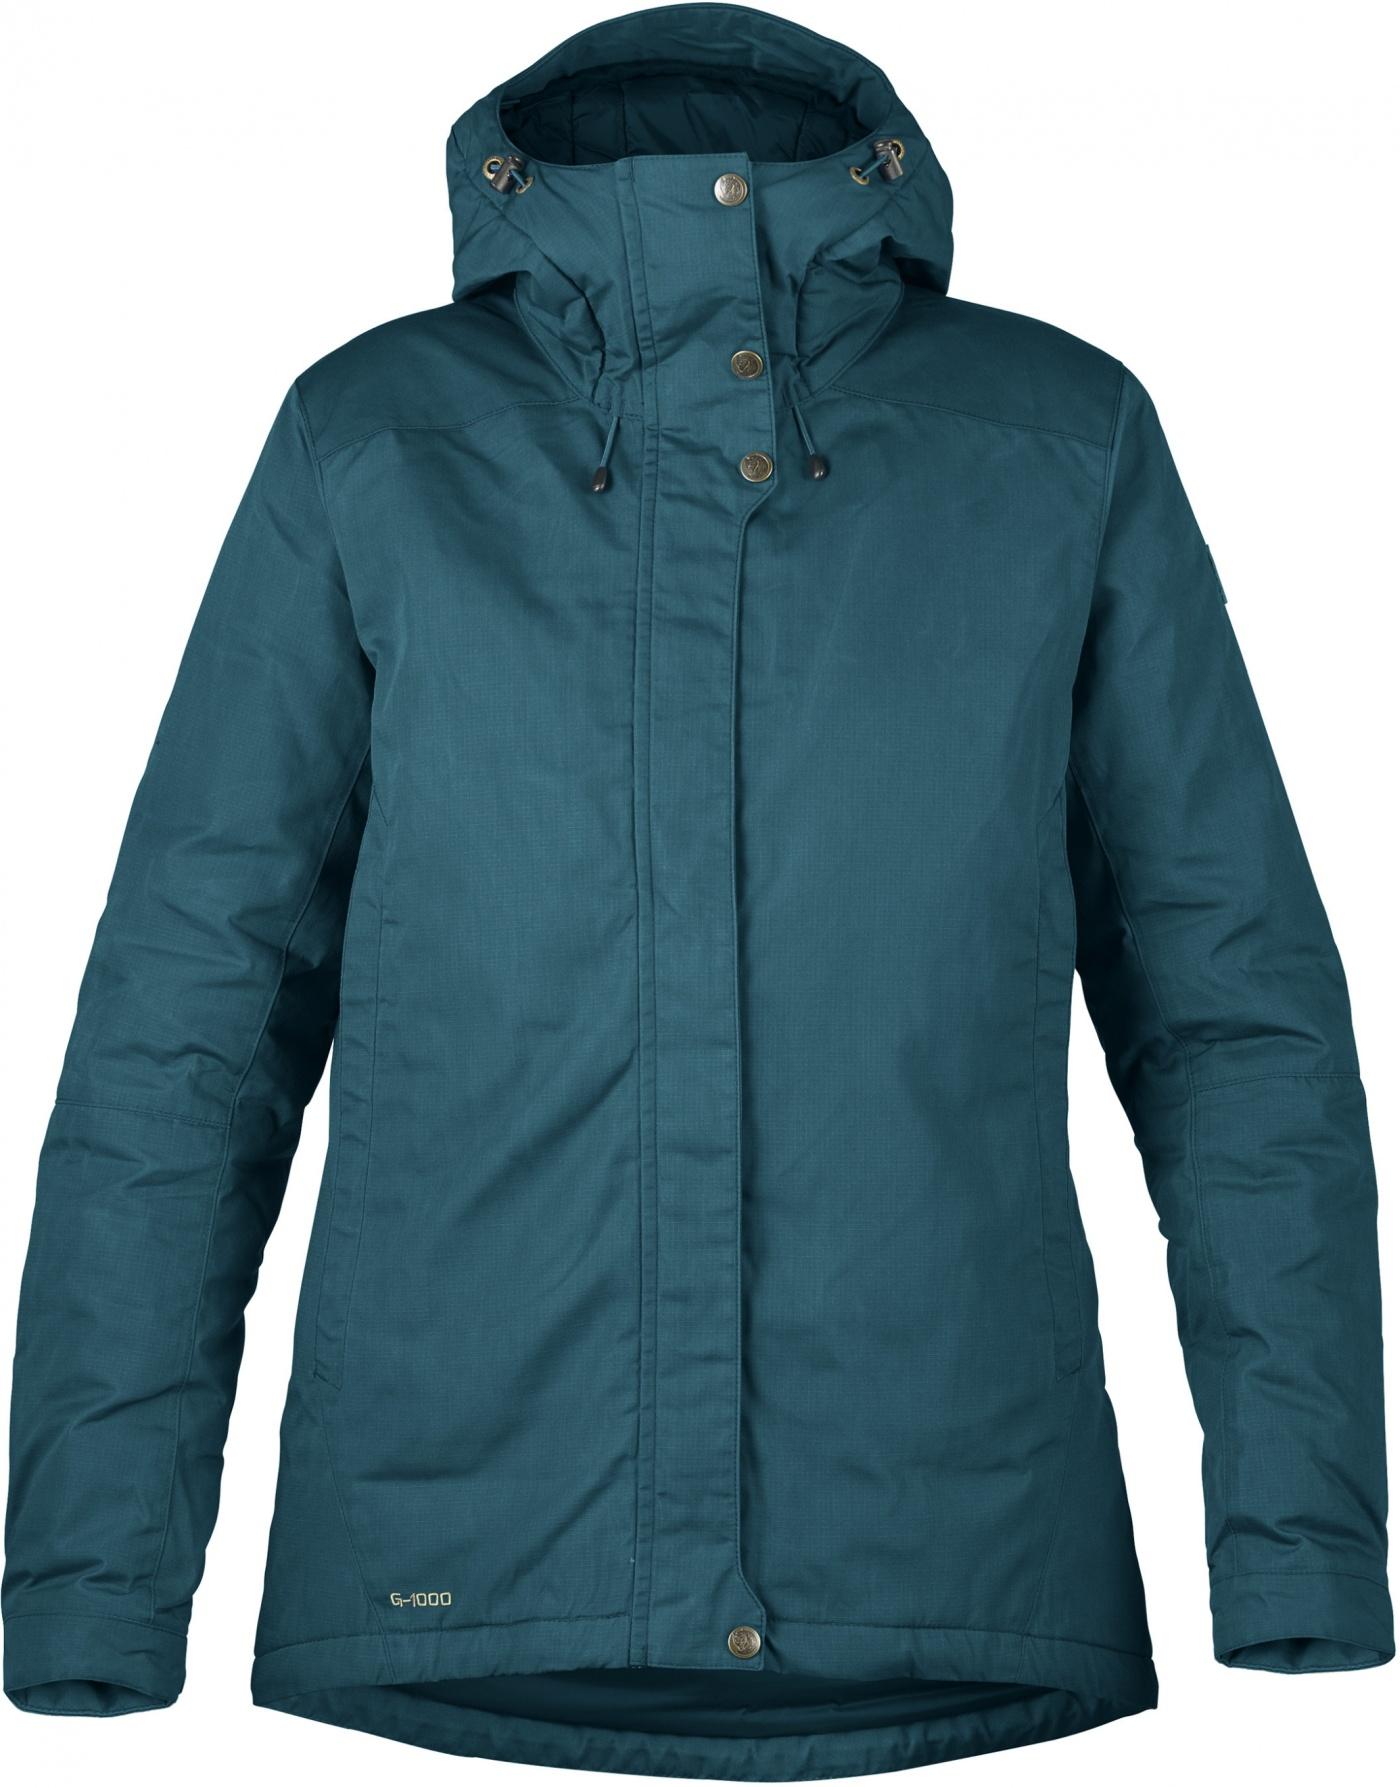 FjallRaven Skogsö Padded Jacket W Glacier Green-30